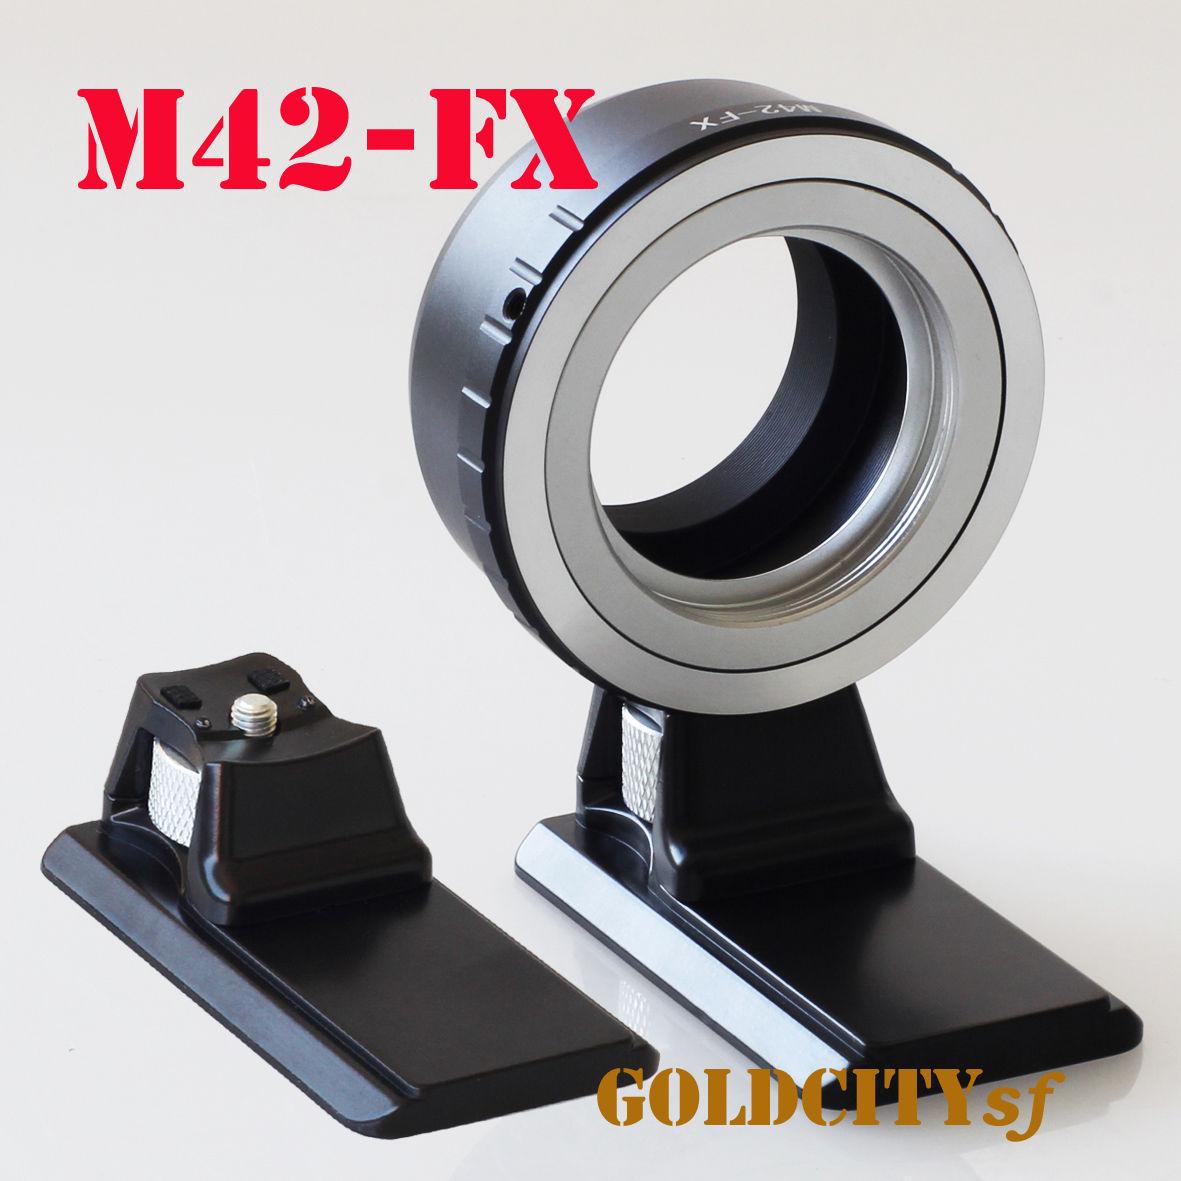 M42 42mm objektiv adapter ring mit Stativ für fuji film fuji FX X X-E2/X-E1/X-Pro1 /X-M1/X-A2/X-A1/X-T1 xpro2 kamera